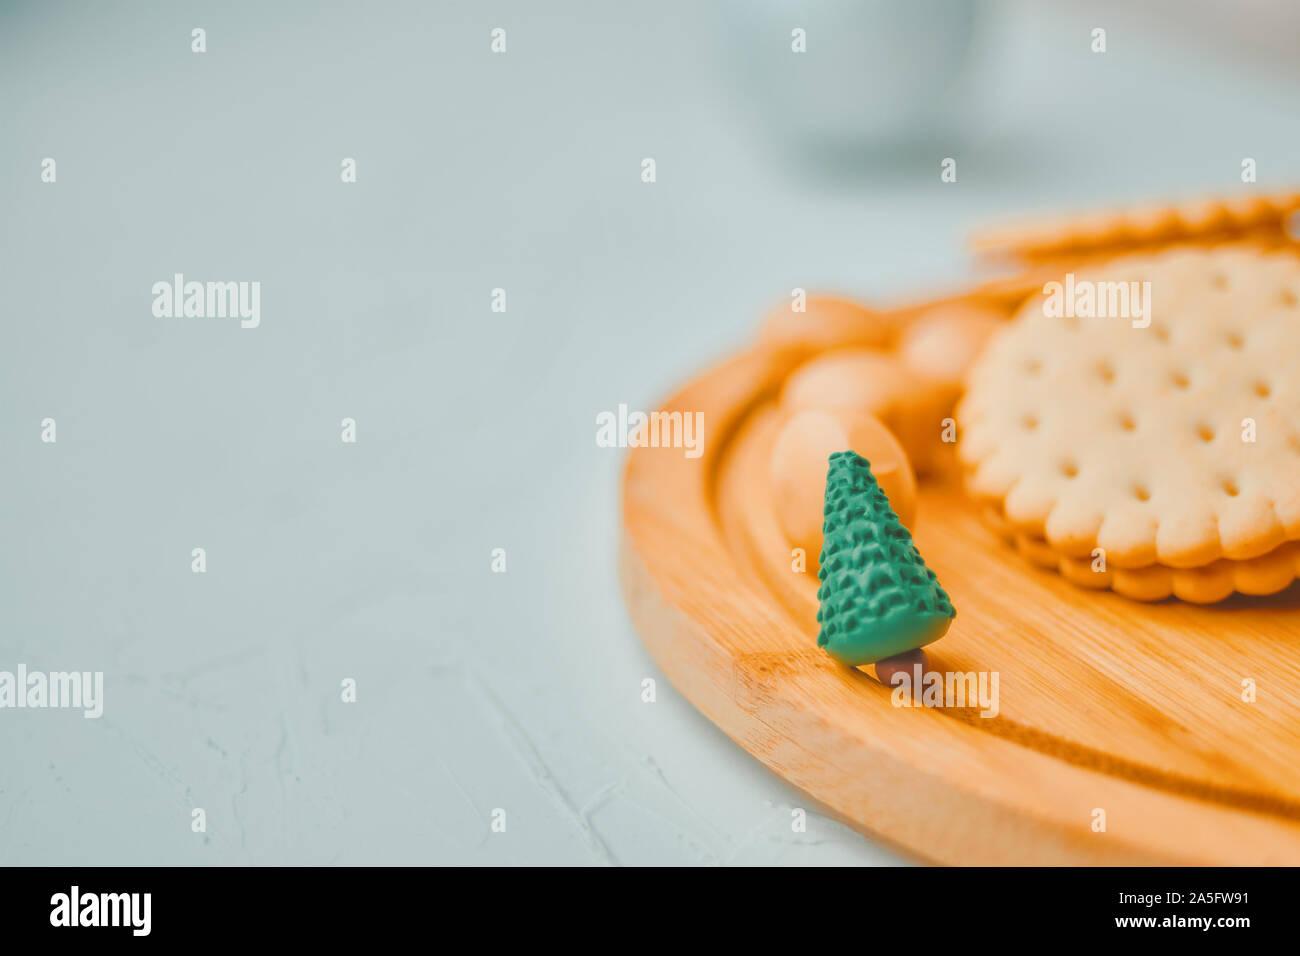 Mini Christmas Tree With Cookies On White Table Stock Photo Alamy